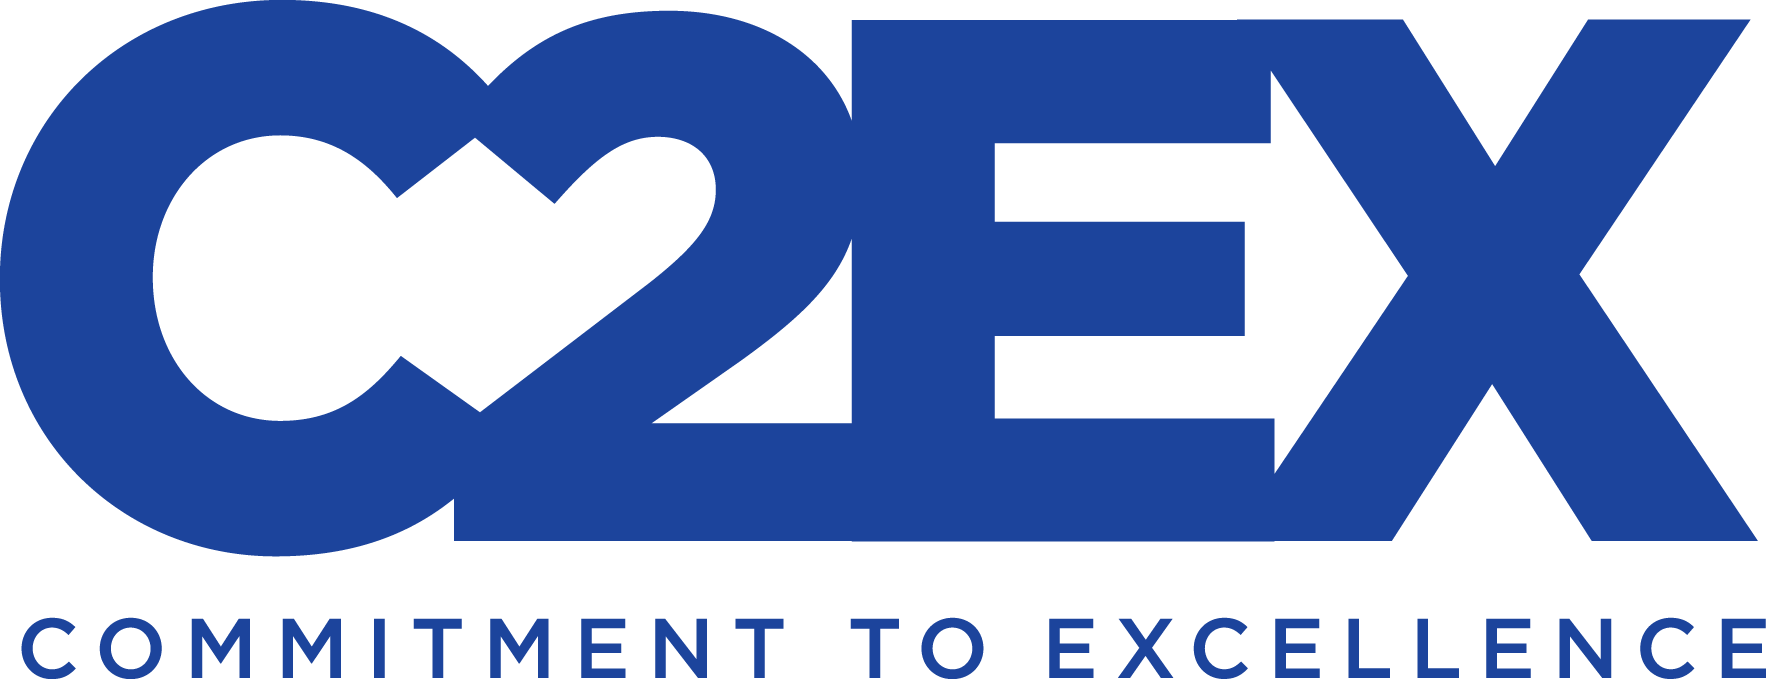 C2EX Logo Horizontal